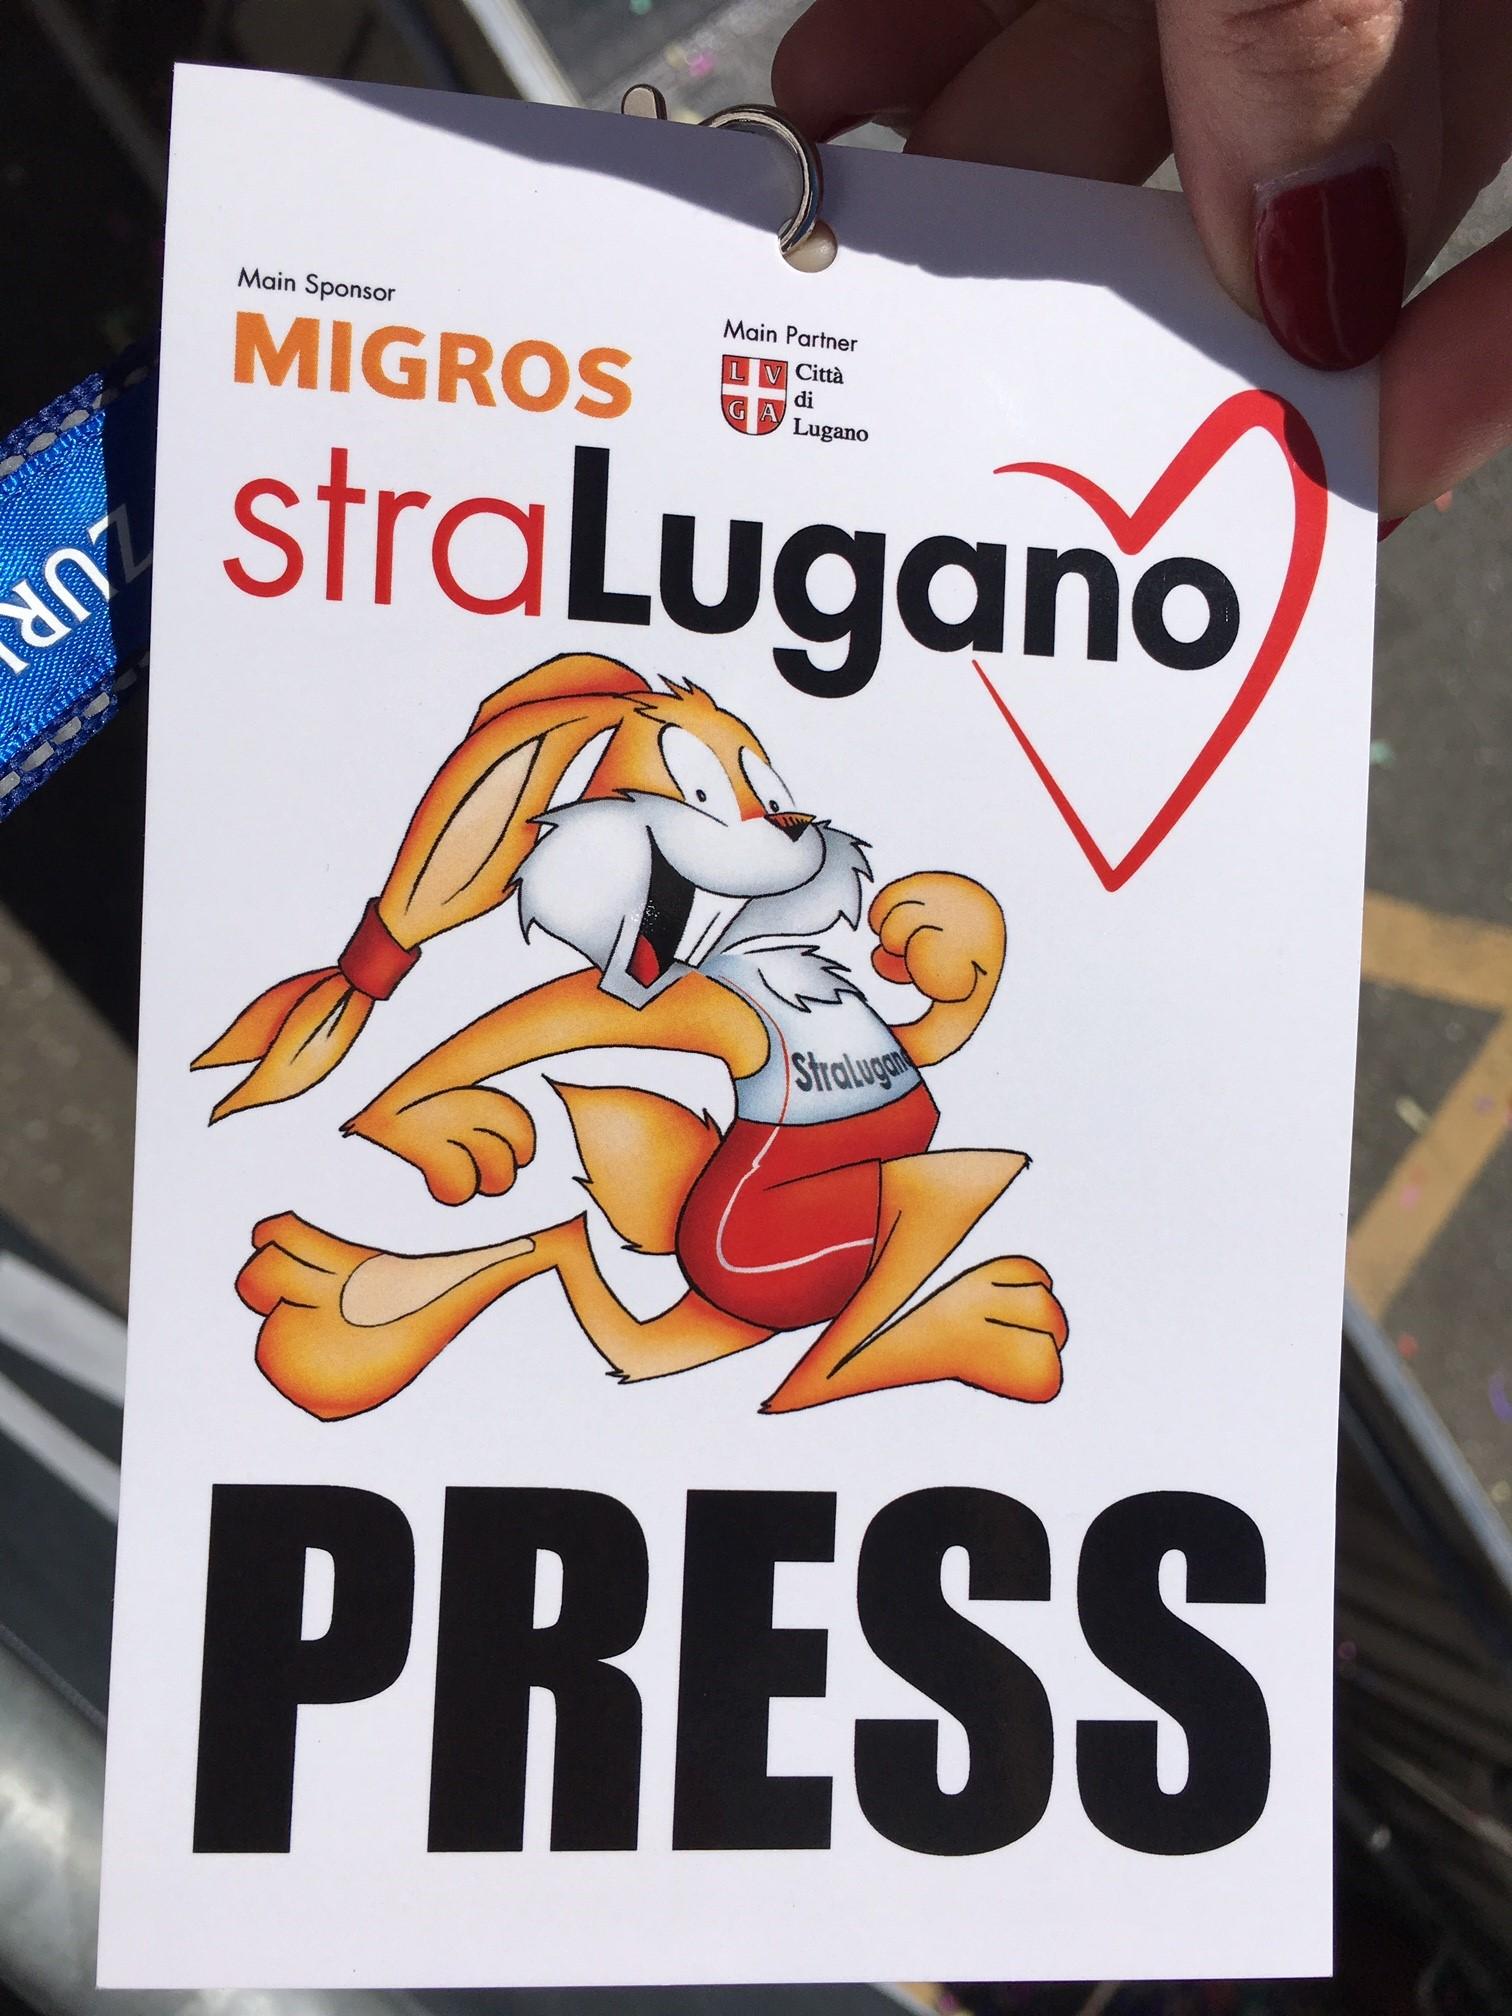 Stralugano 2017 Press